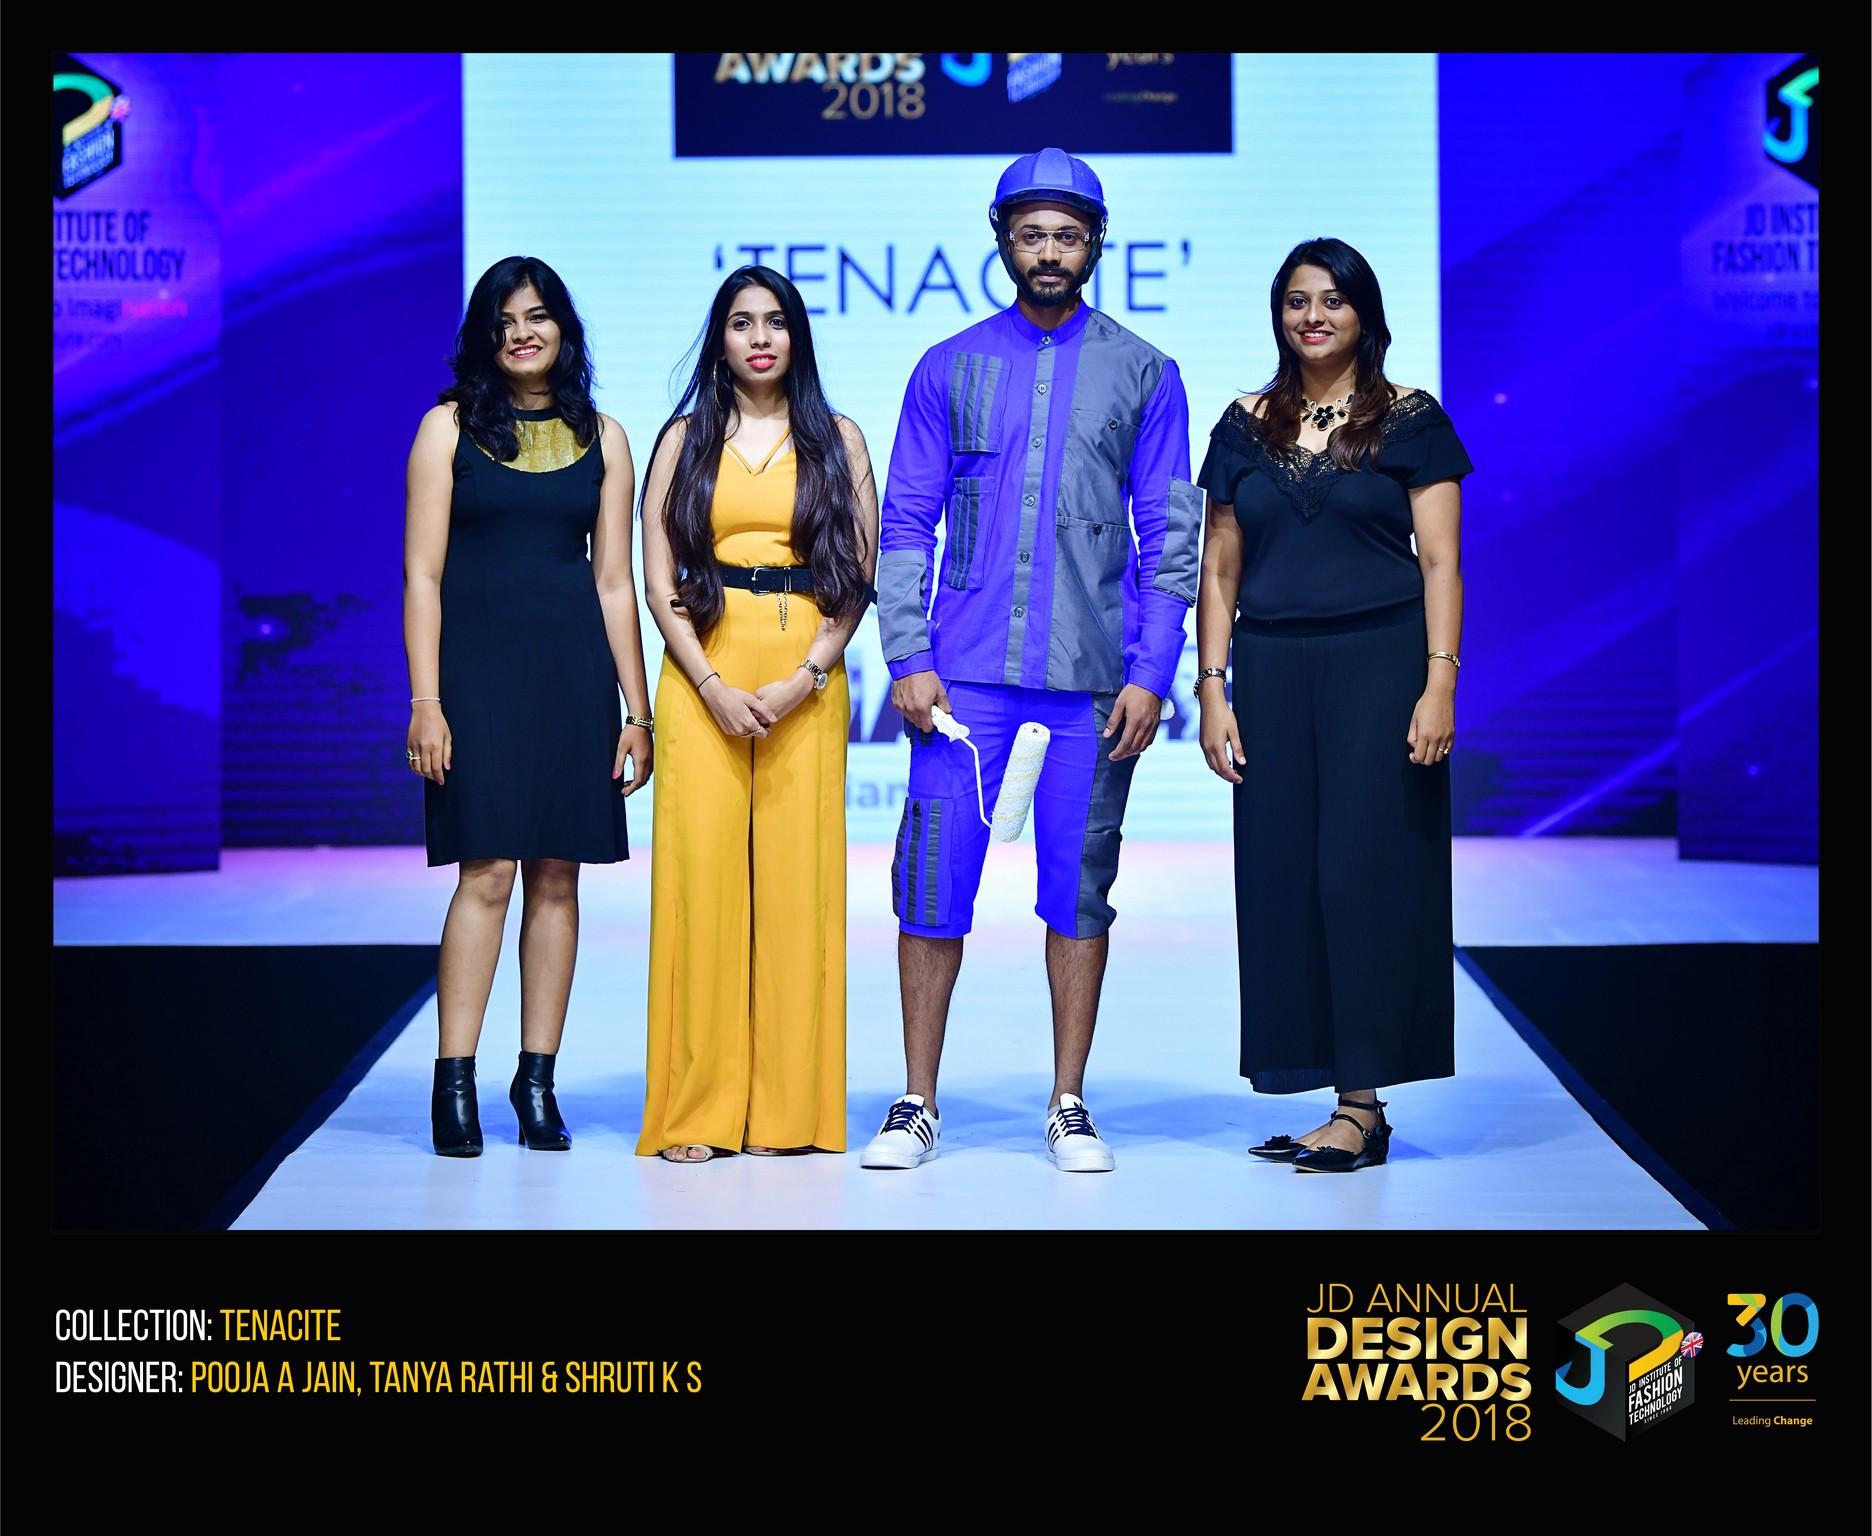 Tenacite – Change – JD Annual Design Awards 2018 | Designer: Tanya, Pooja and Shruti | Photography : Jerin Nath (@jerin_nath) tenacite – change – jd annual design awards 2018 Tenacite – Change – JD Annual Design Awards 2018 TENACITE 8